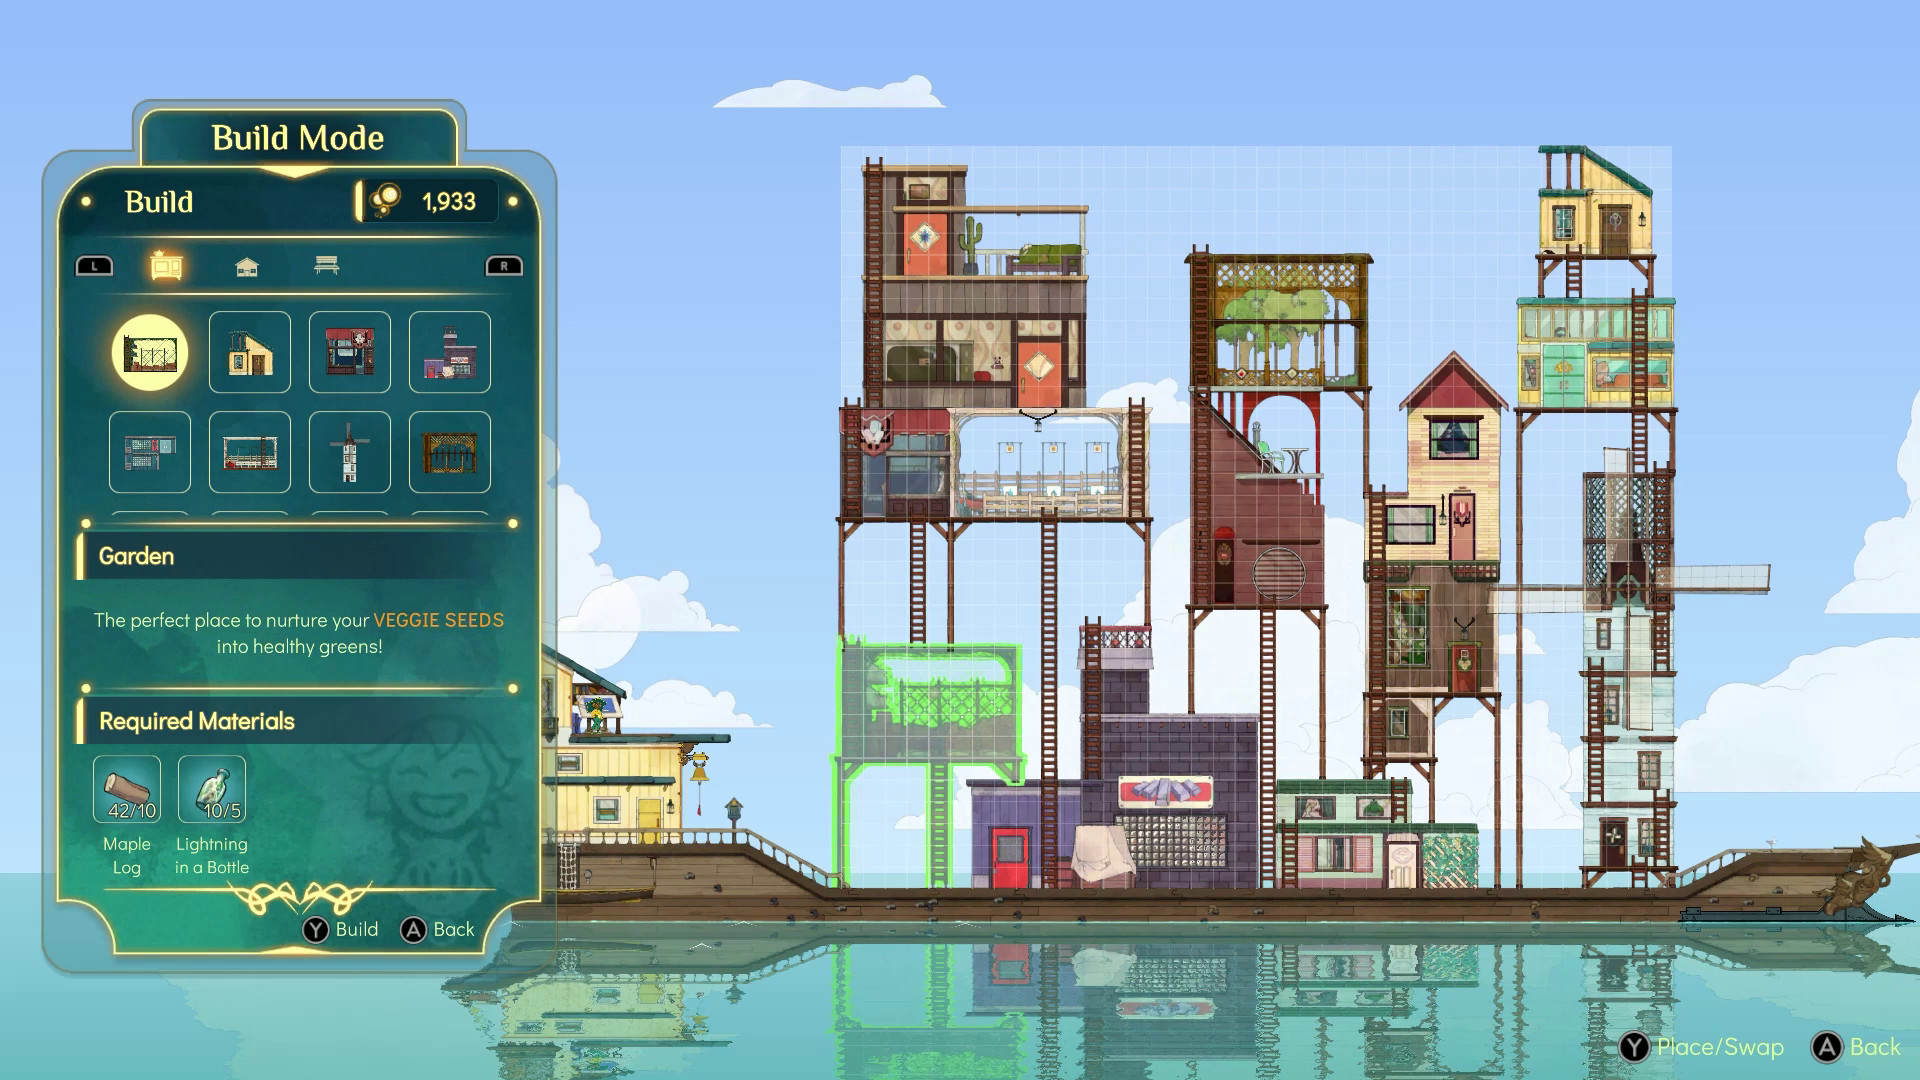 Spiritfarer - Top underappreciated indie games of 2020